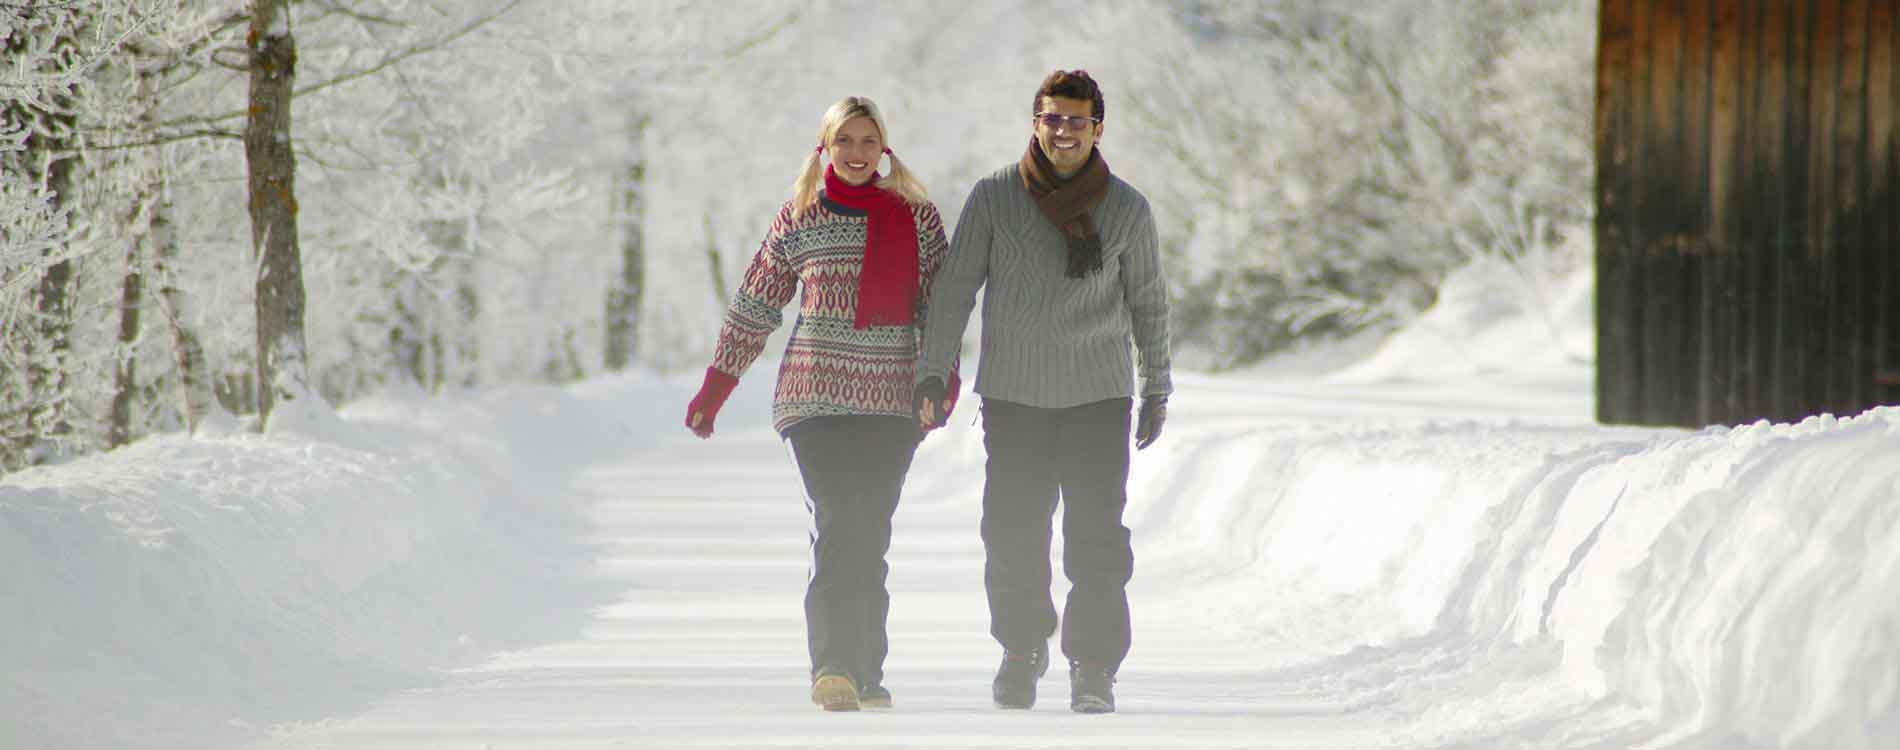 A romantic winter break ski holiday Singer Sporthotel & SPA Berwang Tyrolean Zugspitz Arena Tyrol Austria - Niche Destinations